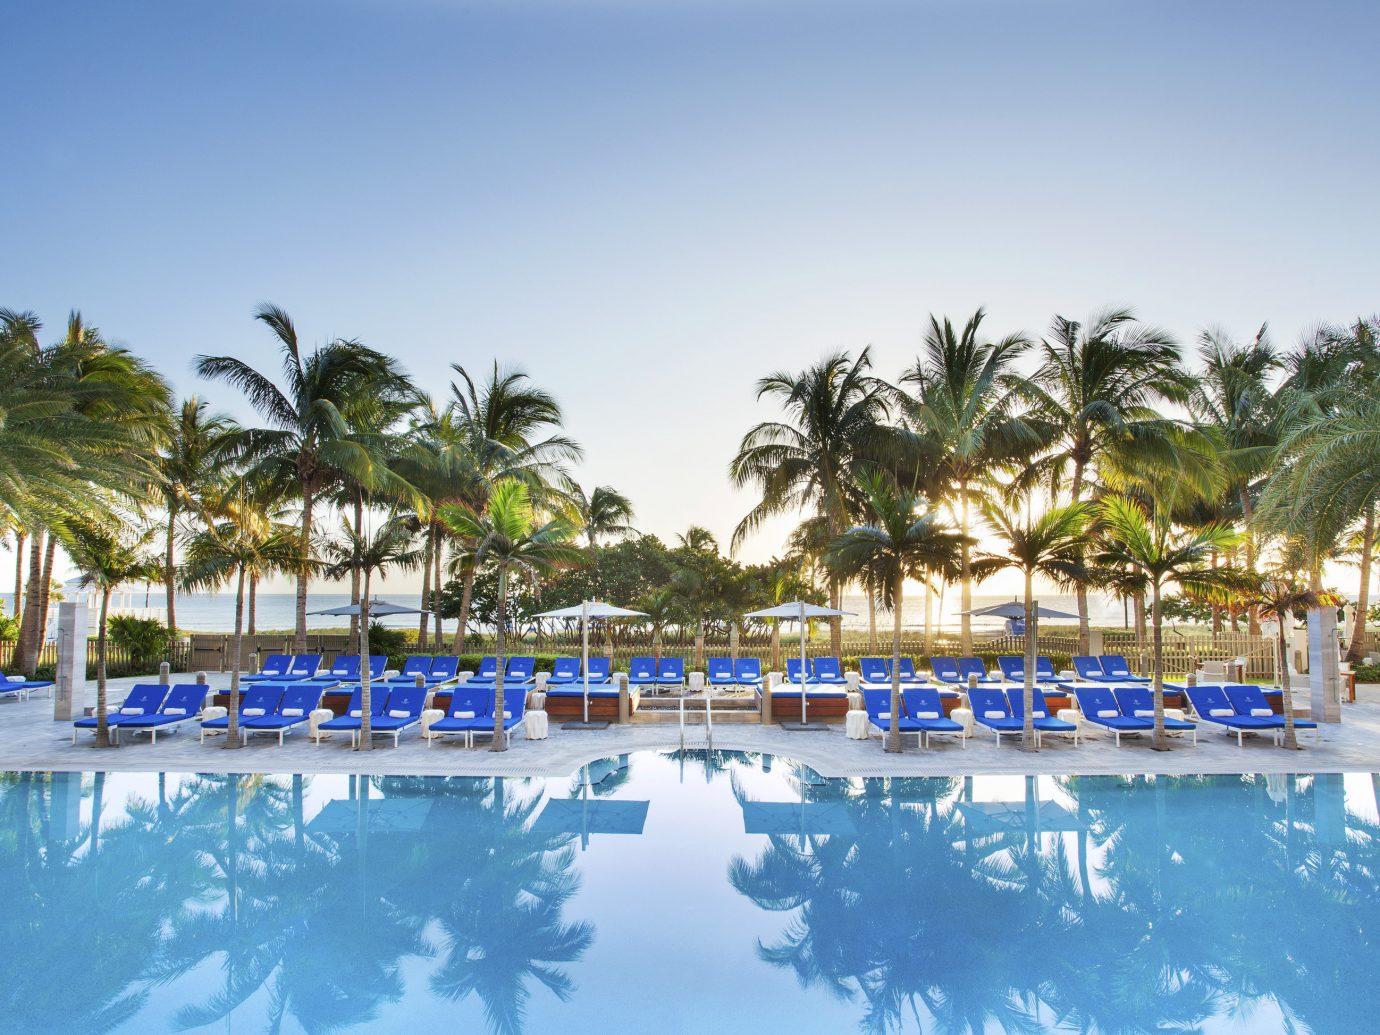 Pool at St. Regis Bal Harbour Miami Luxury Hotel